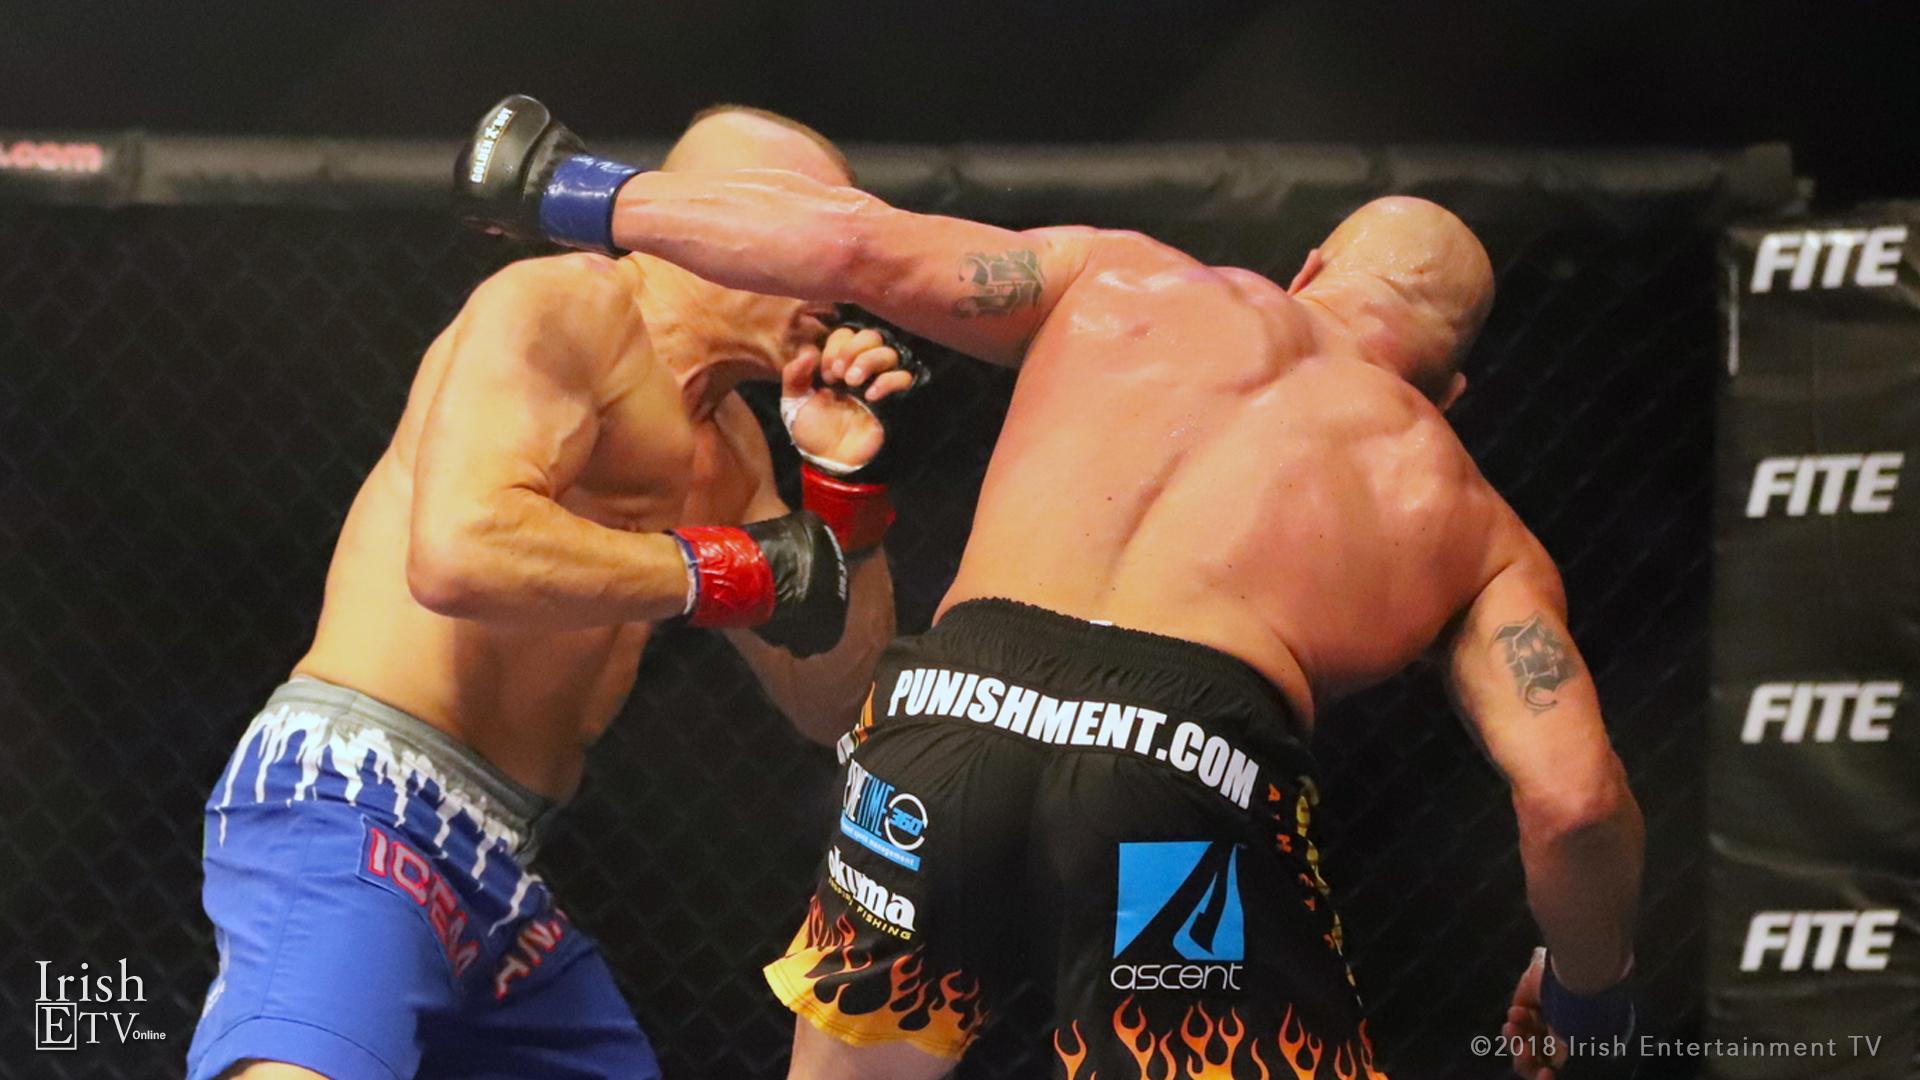 Liddell vs Ortiz 3 | Chuck Liddell and Tito Ortiz  Liddell vs Ortiz 3 | Chuck Liddell  Liddell vs Ortiz 3 | Tito Ortiz  LiddellOrtiz3